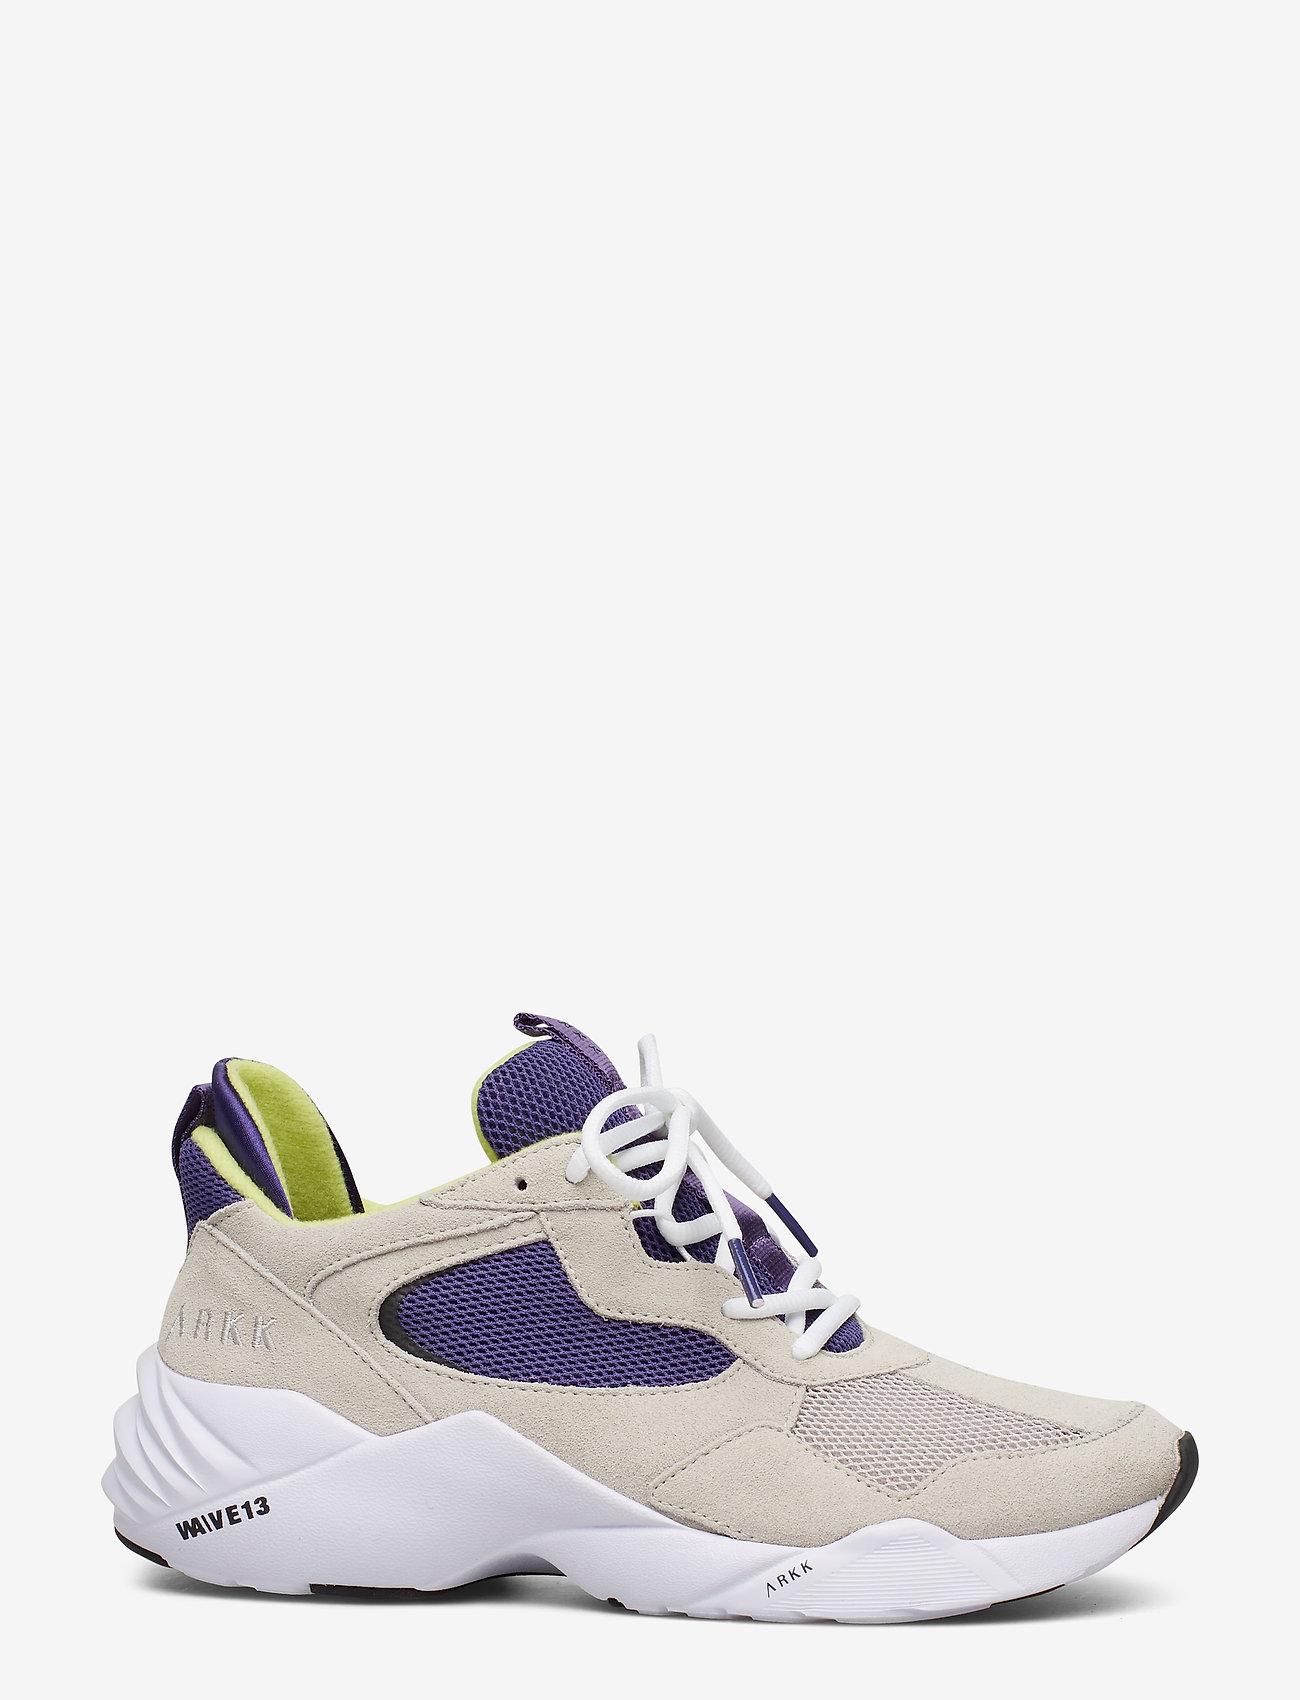 Arkk Copenhagen Kanetyk Suede W13 Wind Grey Bright - Sneakers